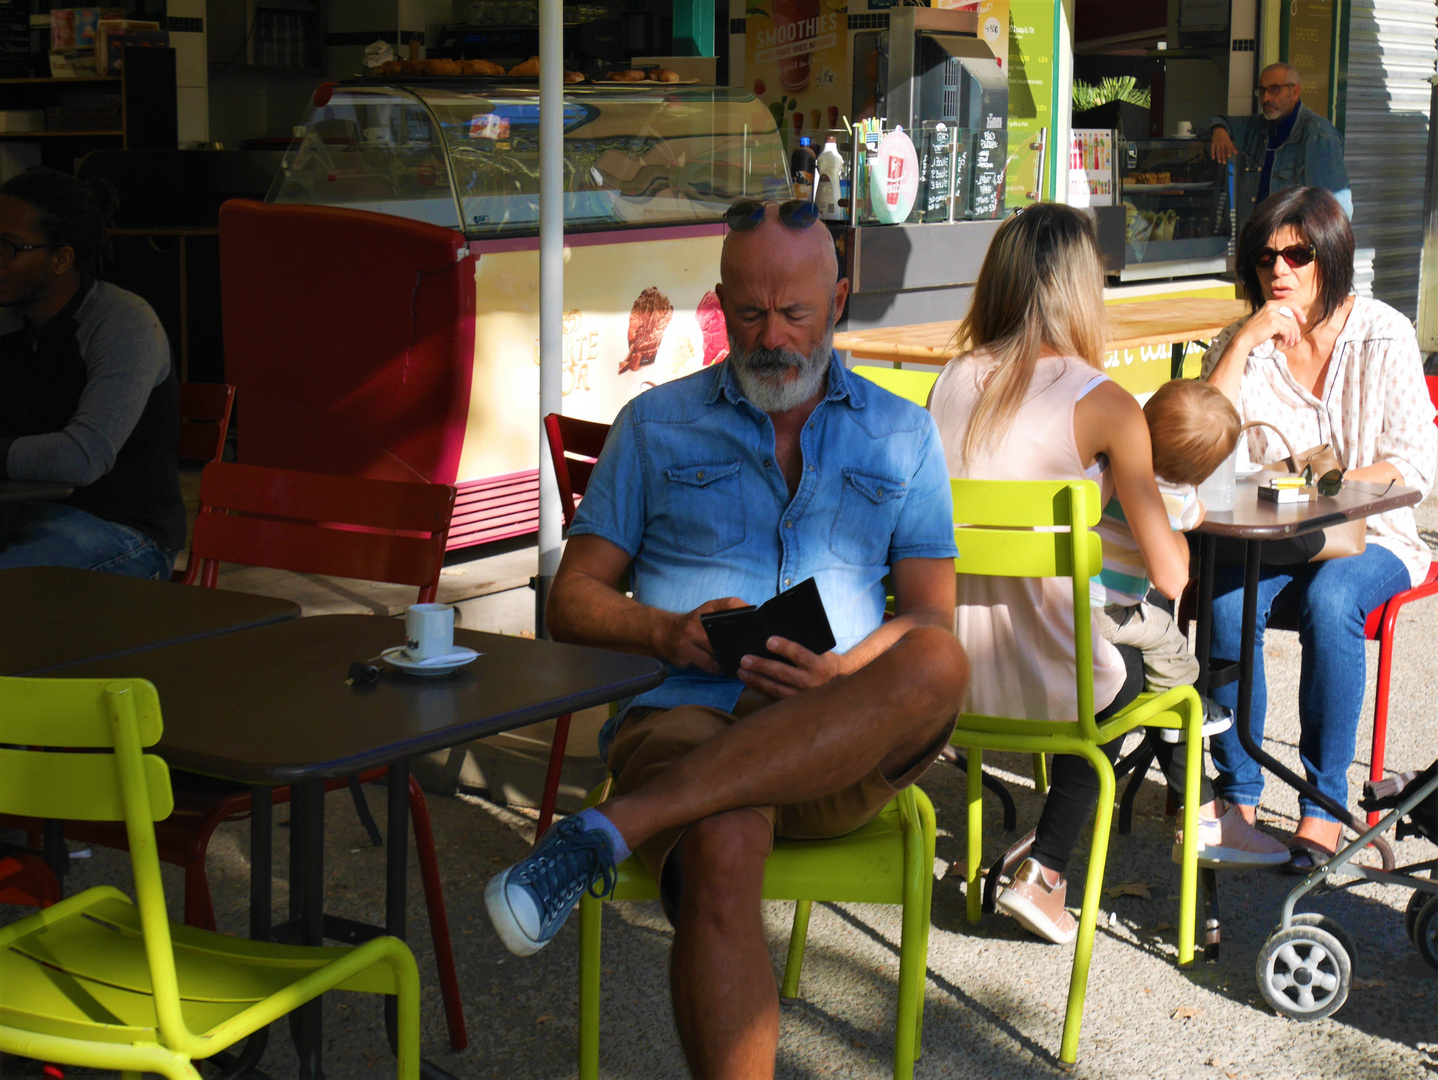 Ambiance en terrasse à Montpellier